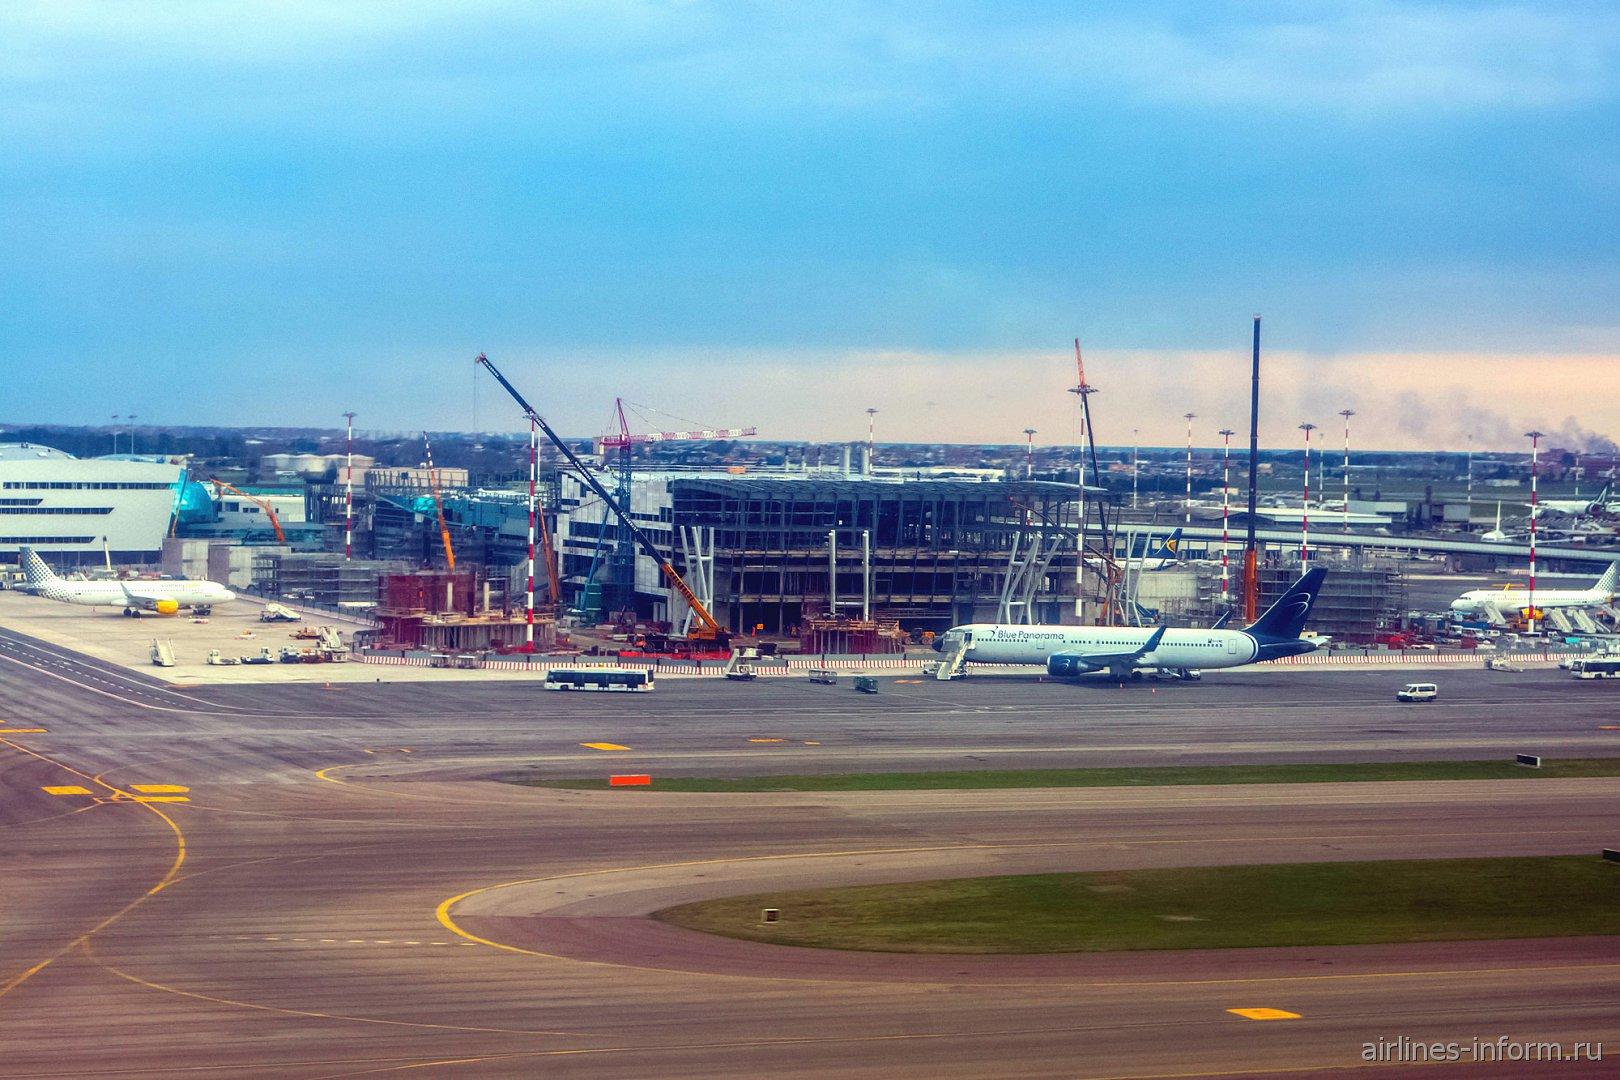 Строящийся пирс F терминала 1 аэропорта Рим Фьюмичино